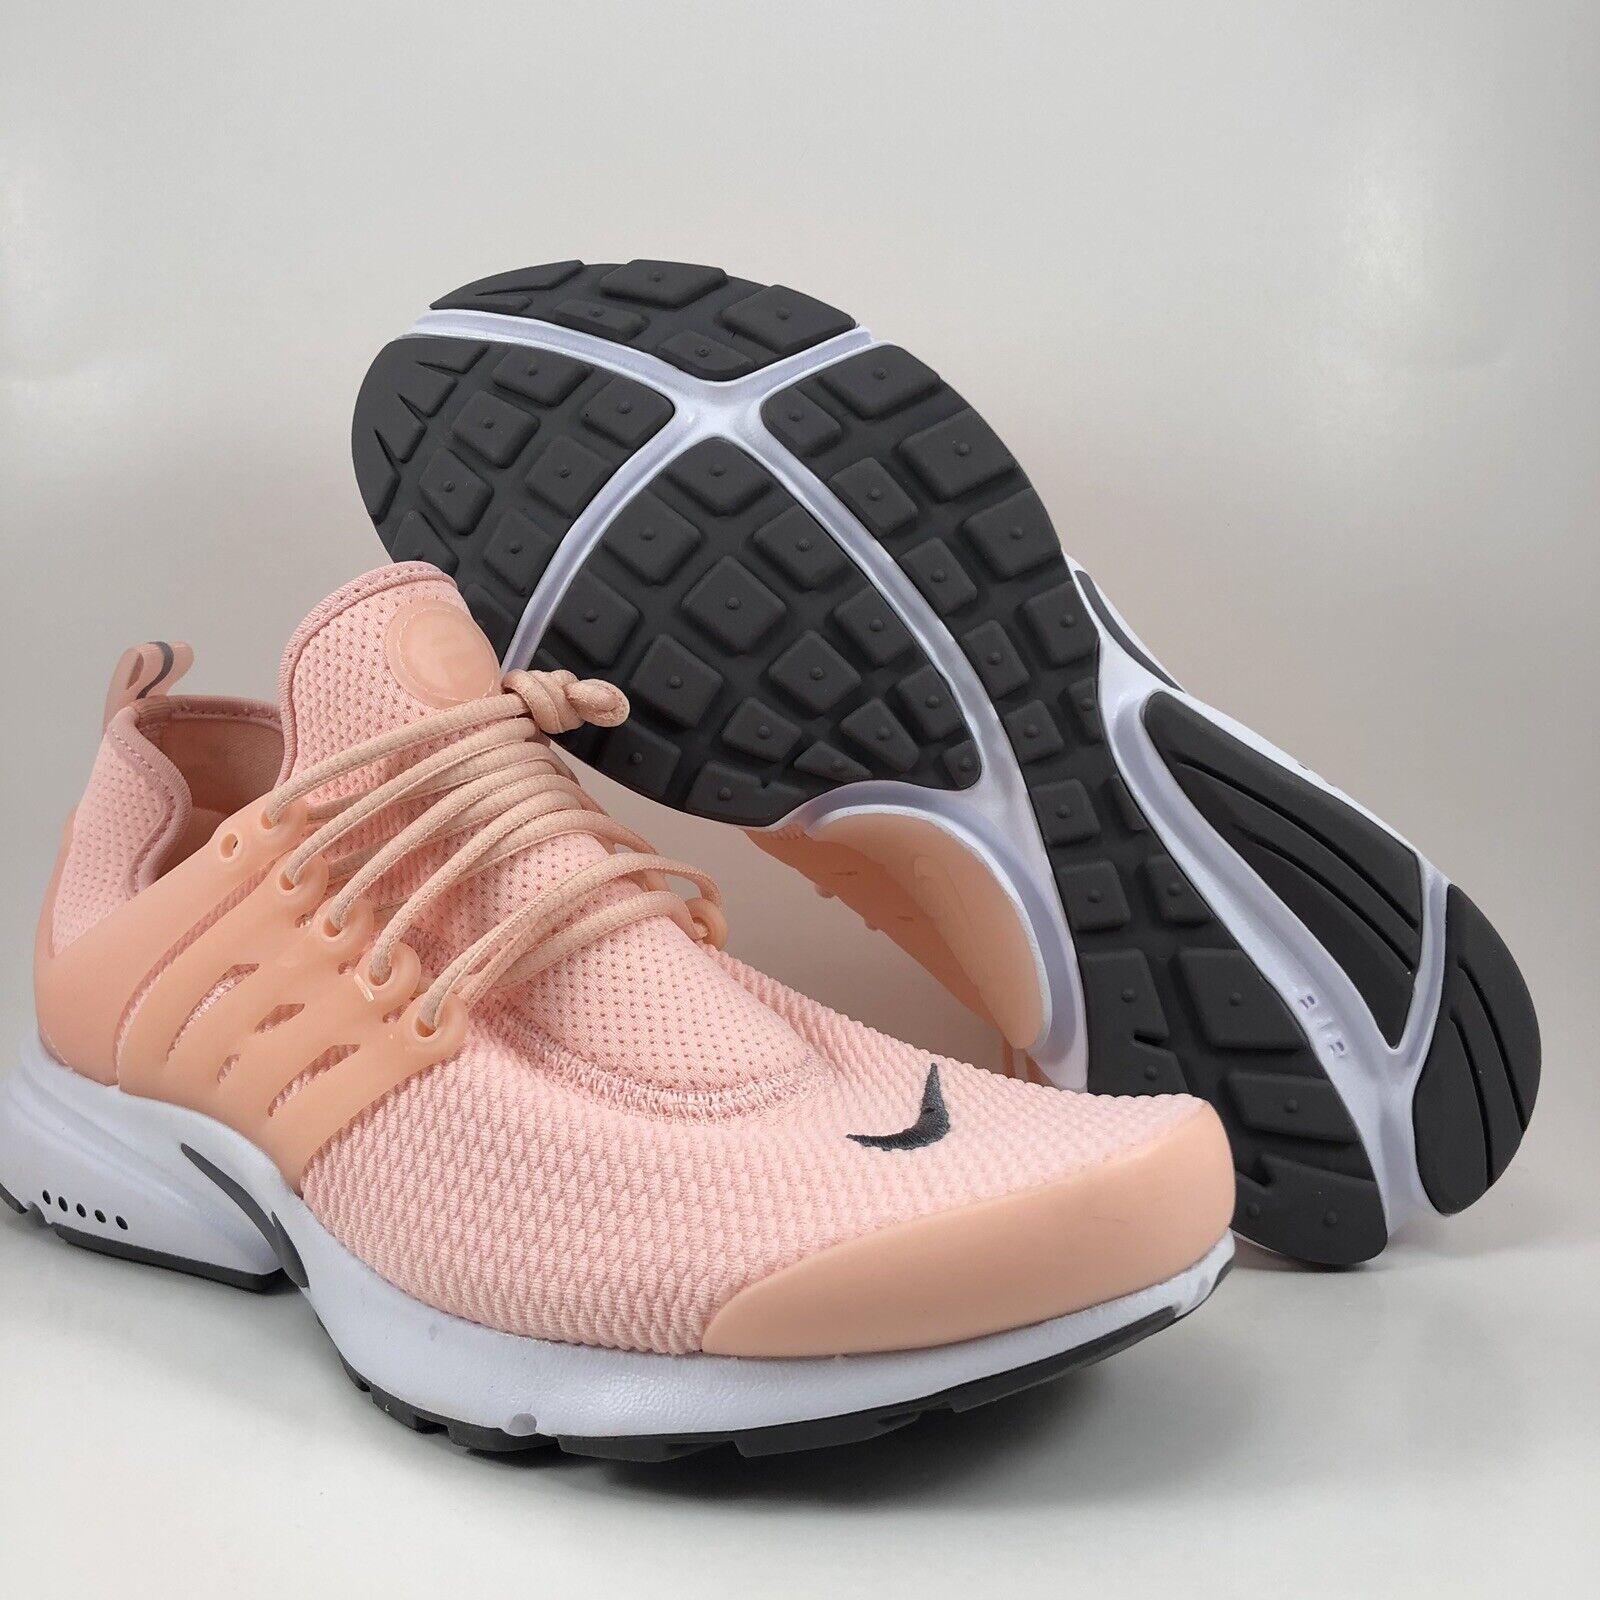 Womens Nike Air Presto BV4239-600 Storm Pink Gunnsmoke NEW Size 10